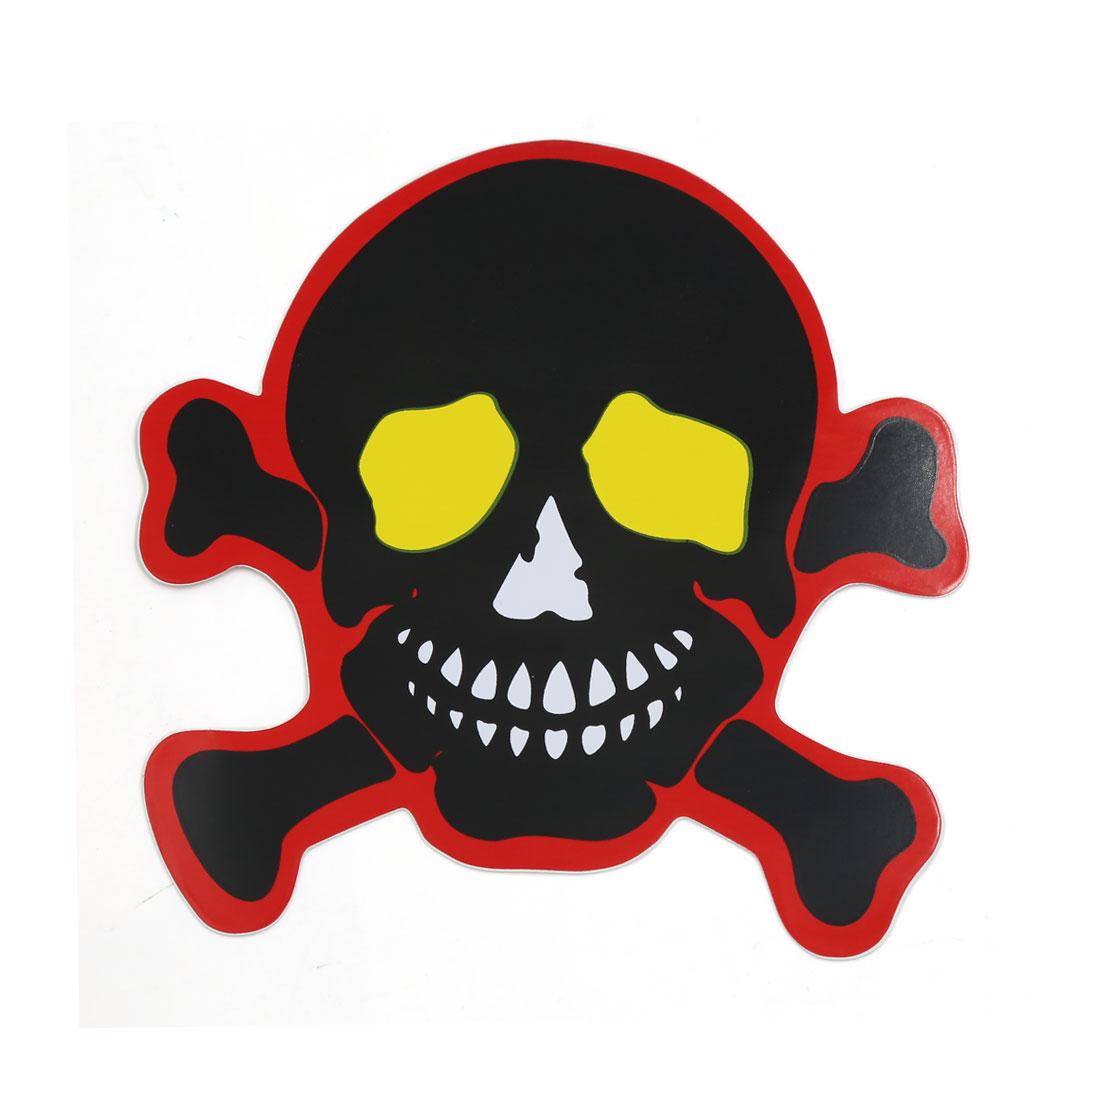 Devil Skull Head Shaped Sticker Decor Car Body Window Door Stickers Decals 10pcs